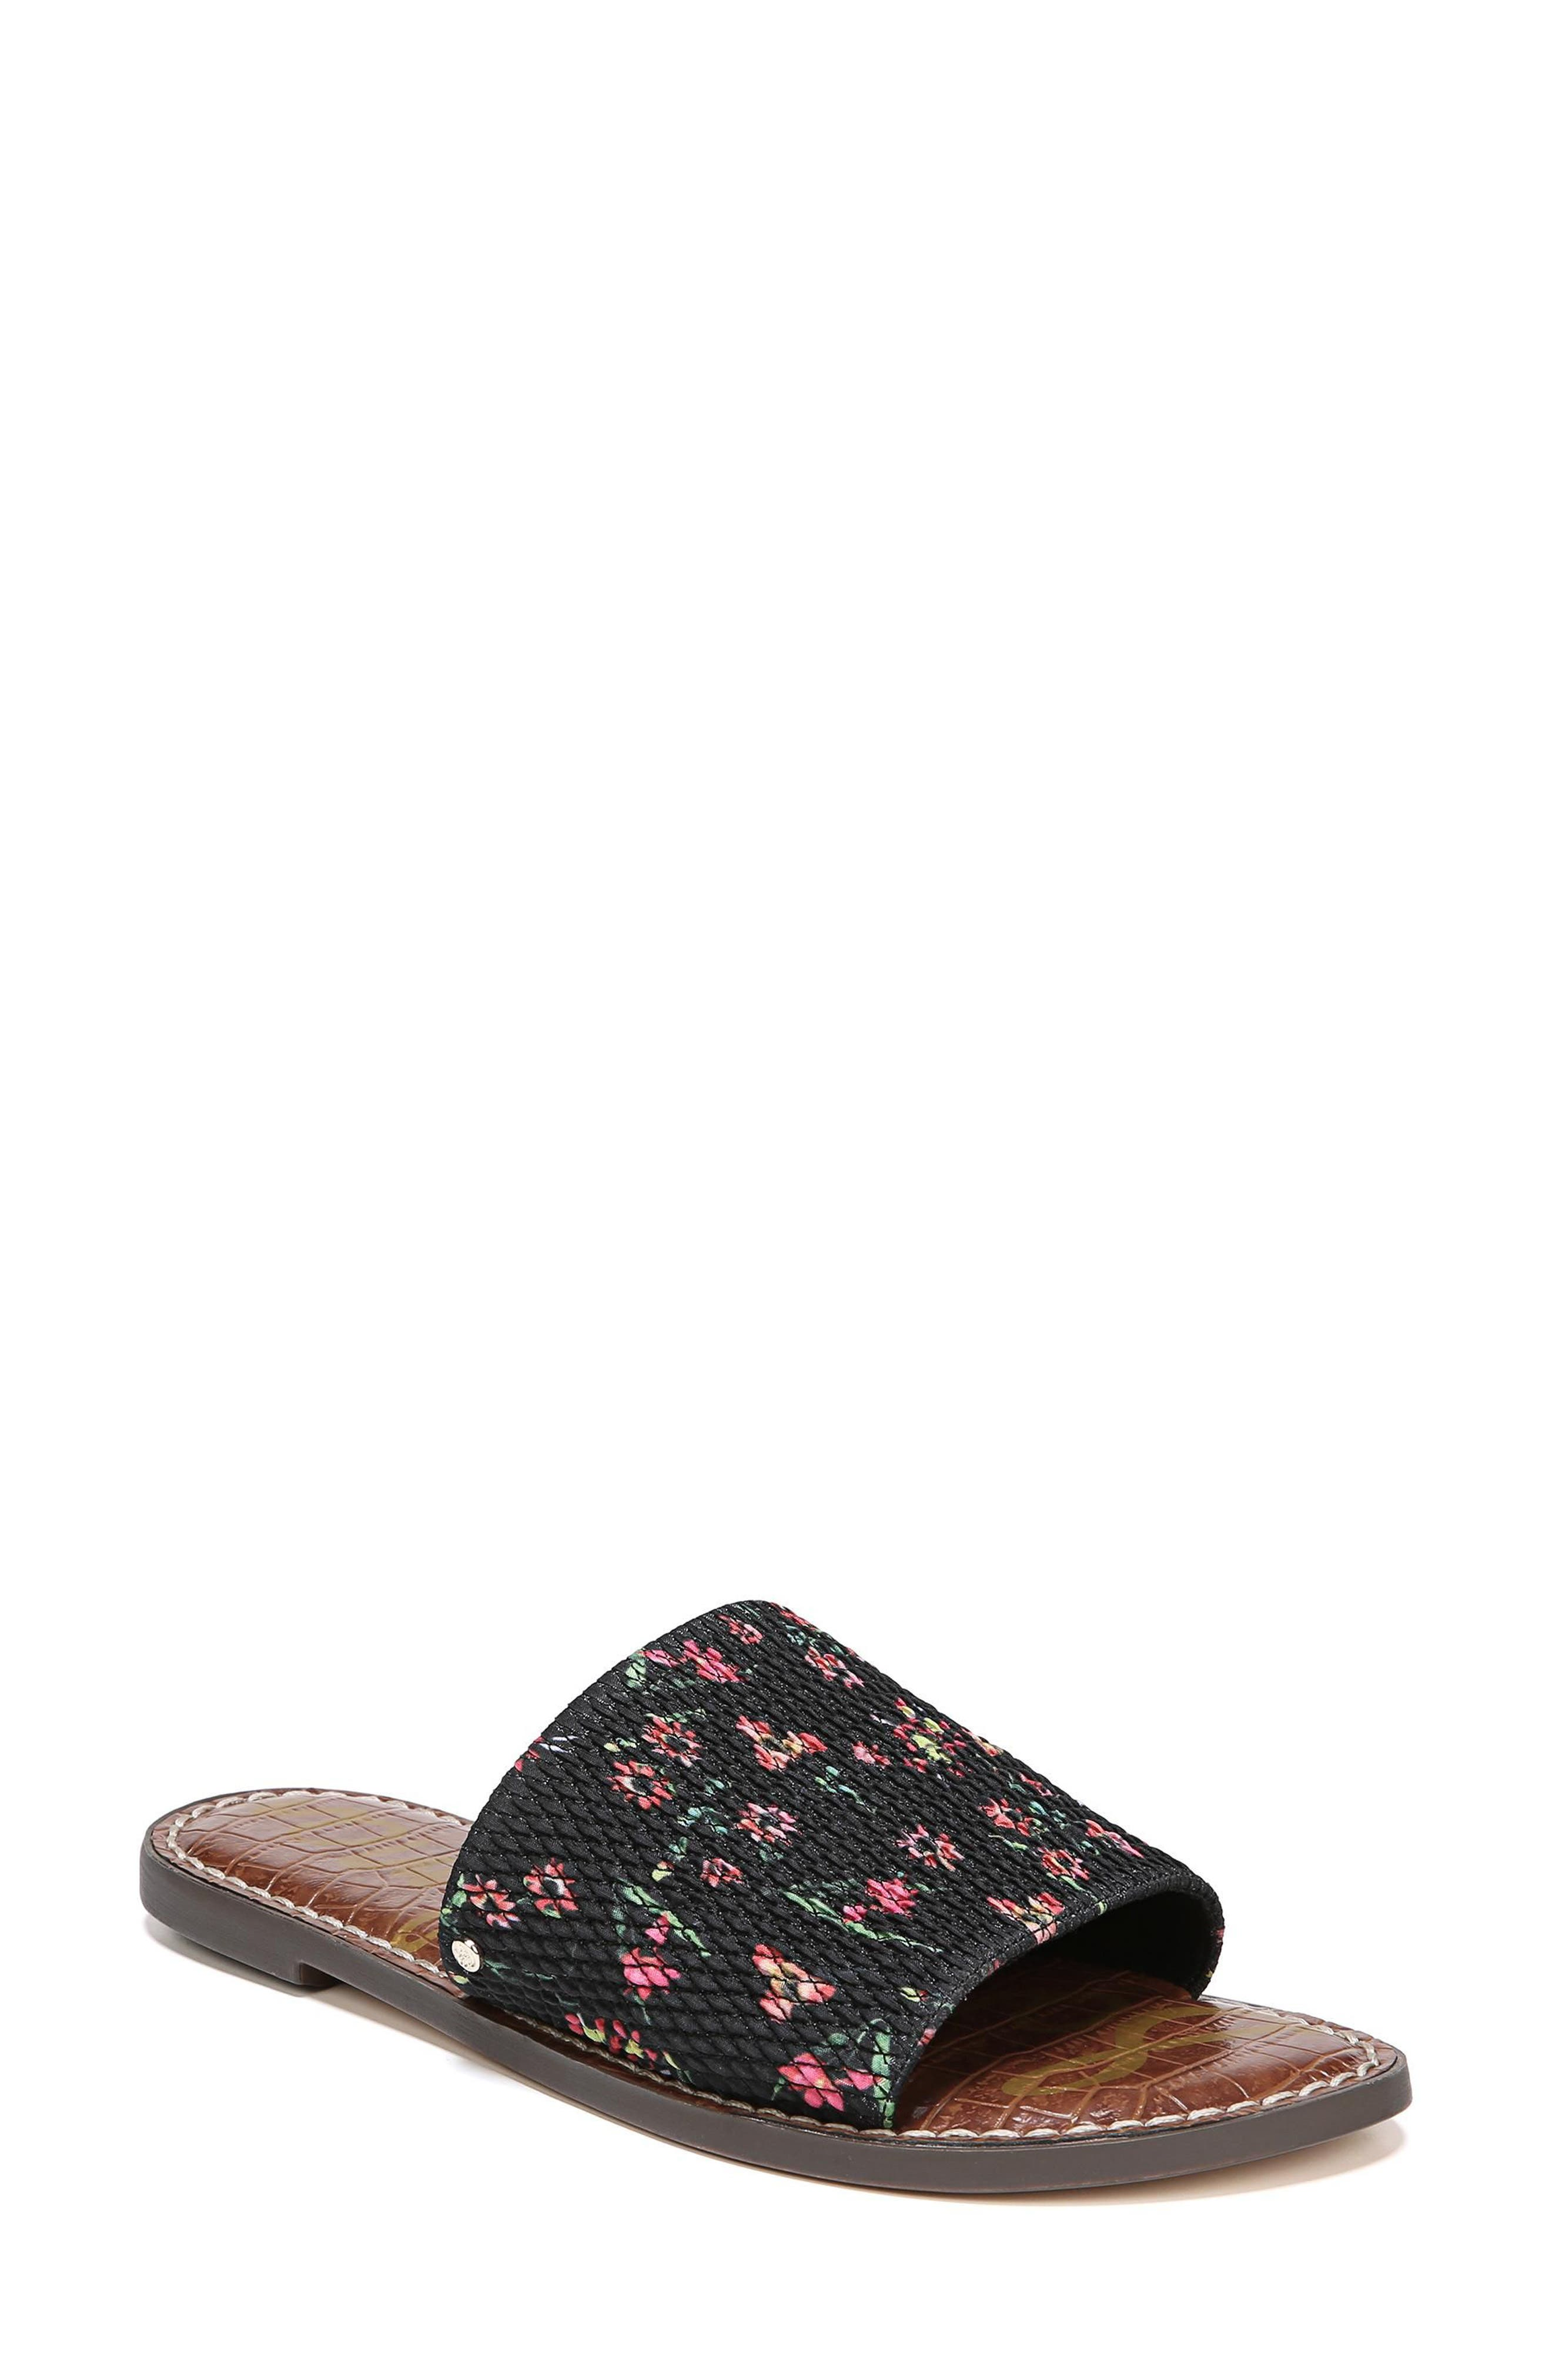 Gio Slide Sandal,                         Main,                         color, BLACK FLORAL PRINT FABRIC